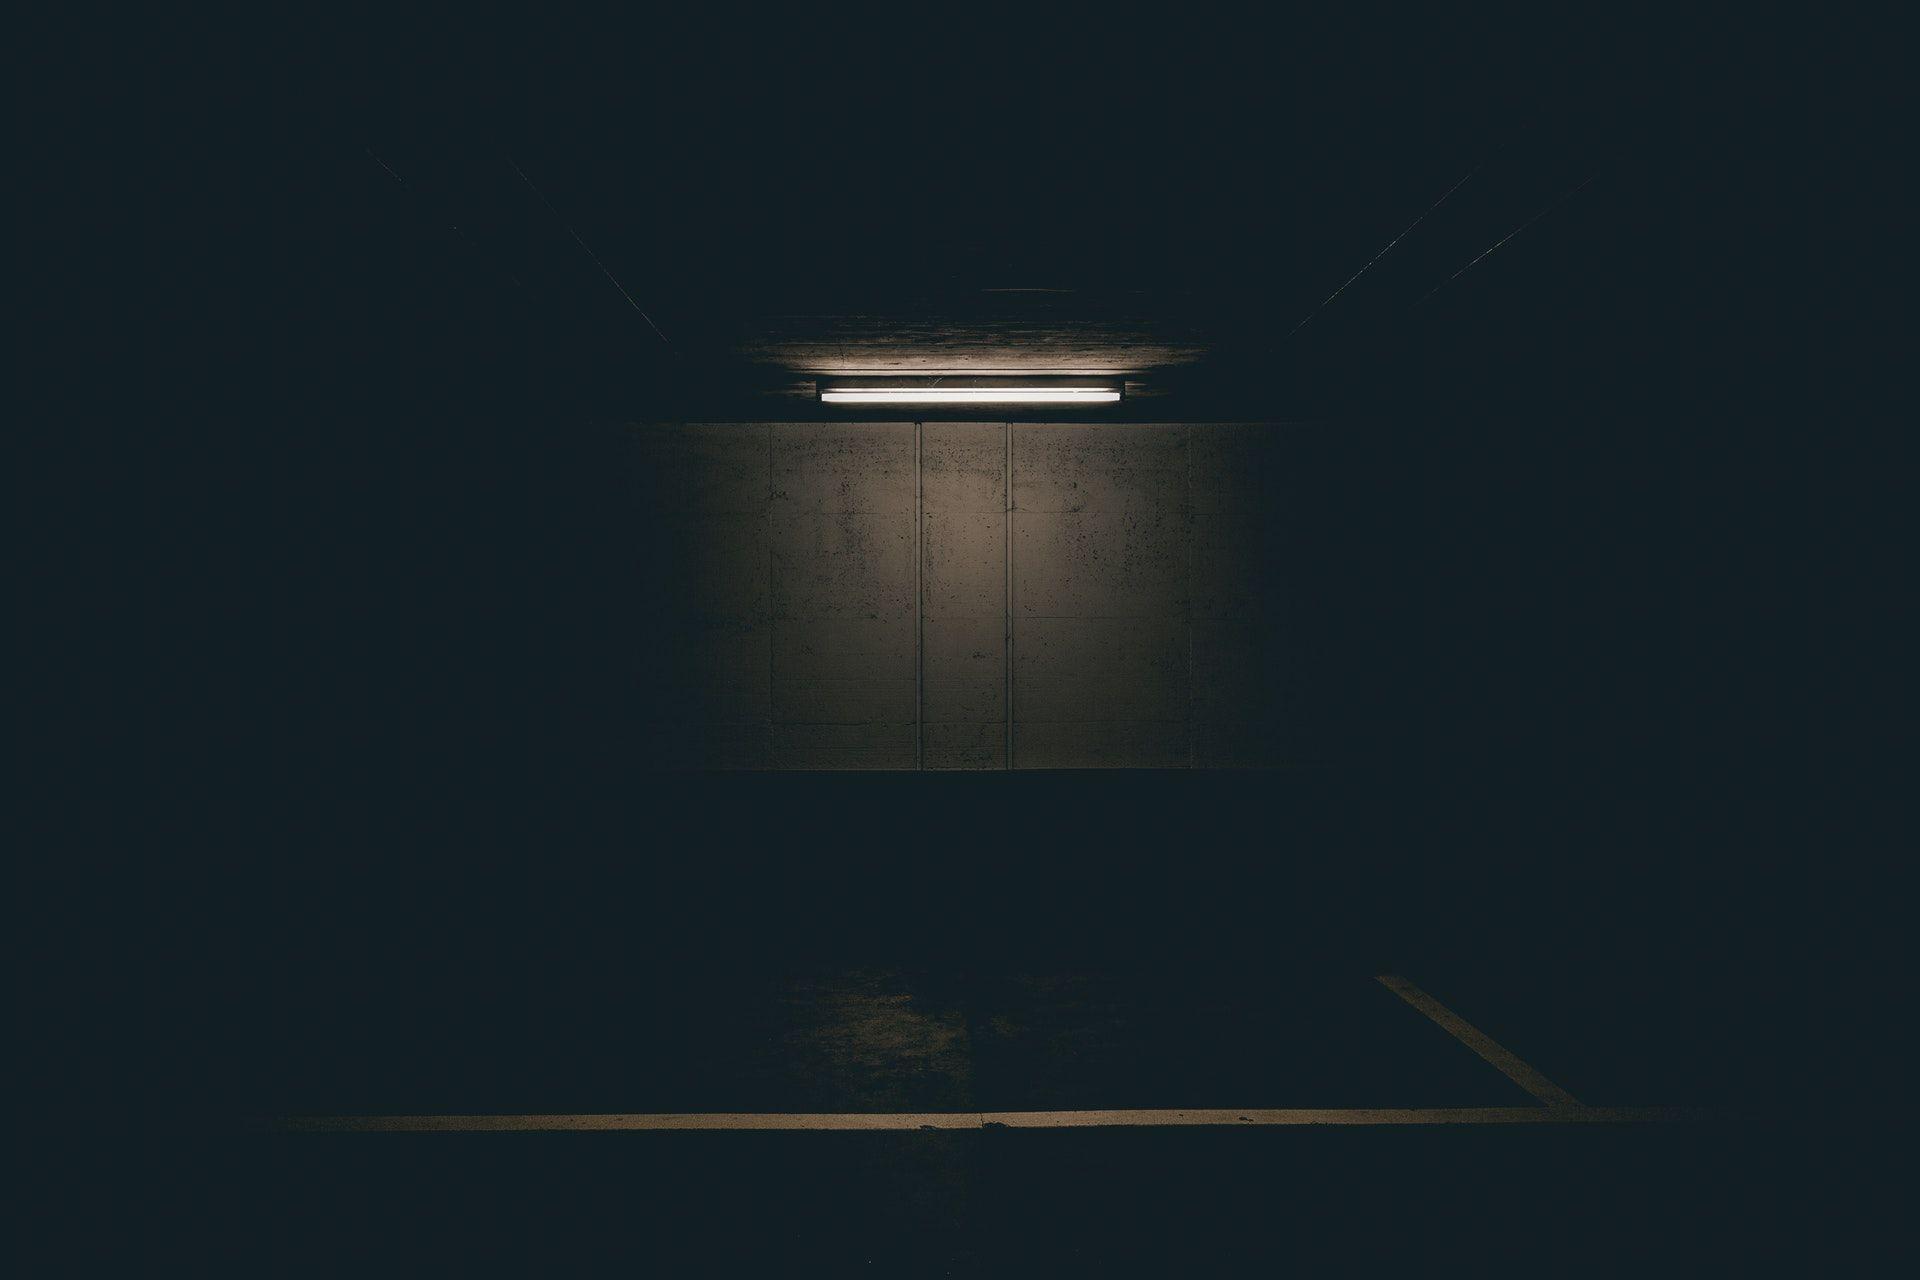 عکس زمینه لامپ فلورسنت در تاریکی پس زمینه